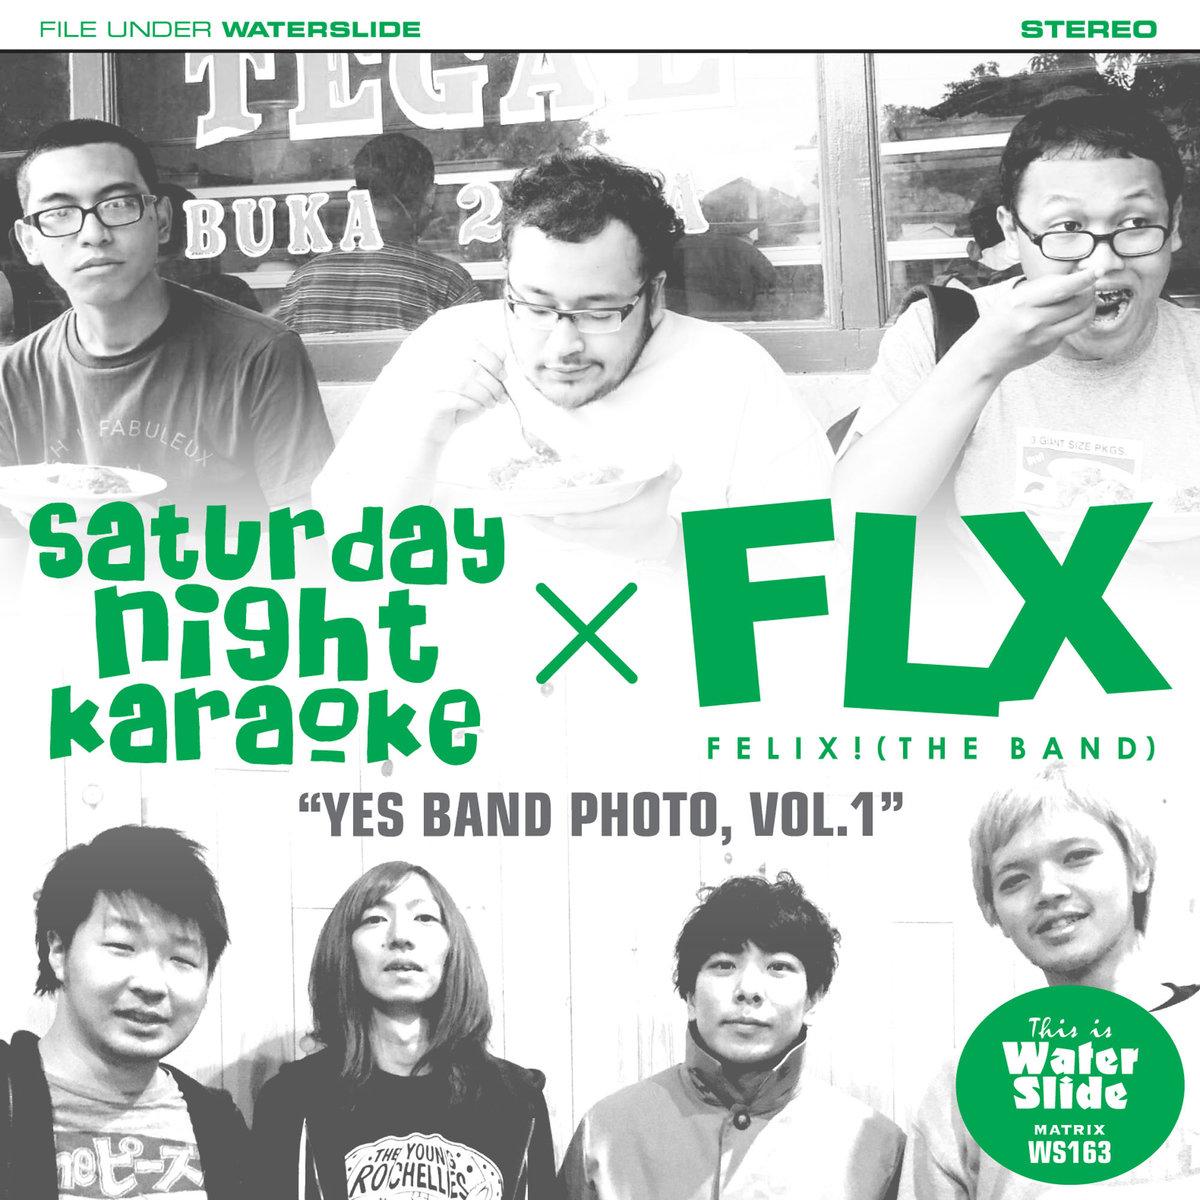 SATURDAY NIGHT KARAOKE / FELIX!(THE BAND)